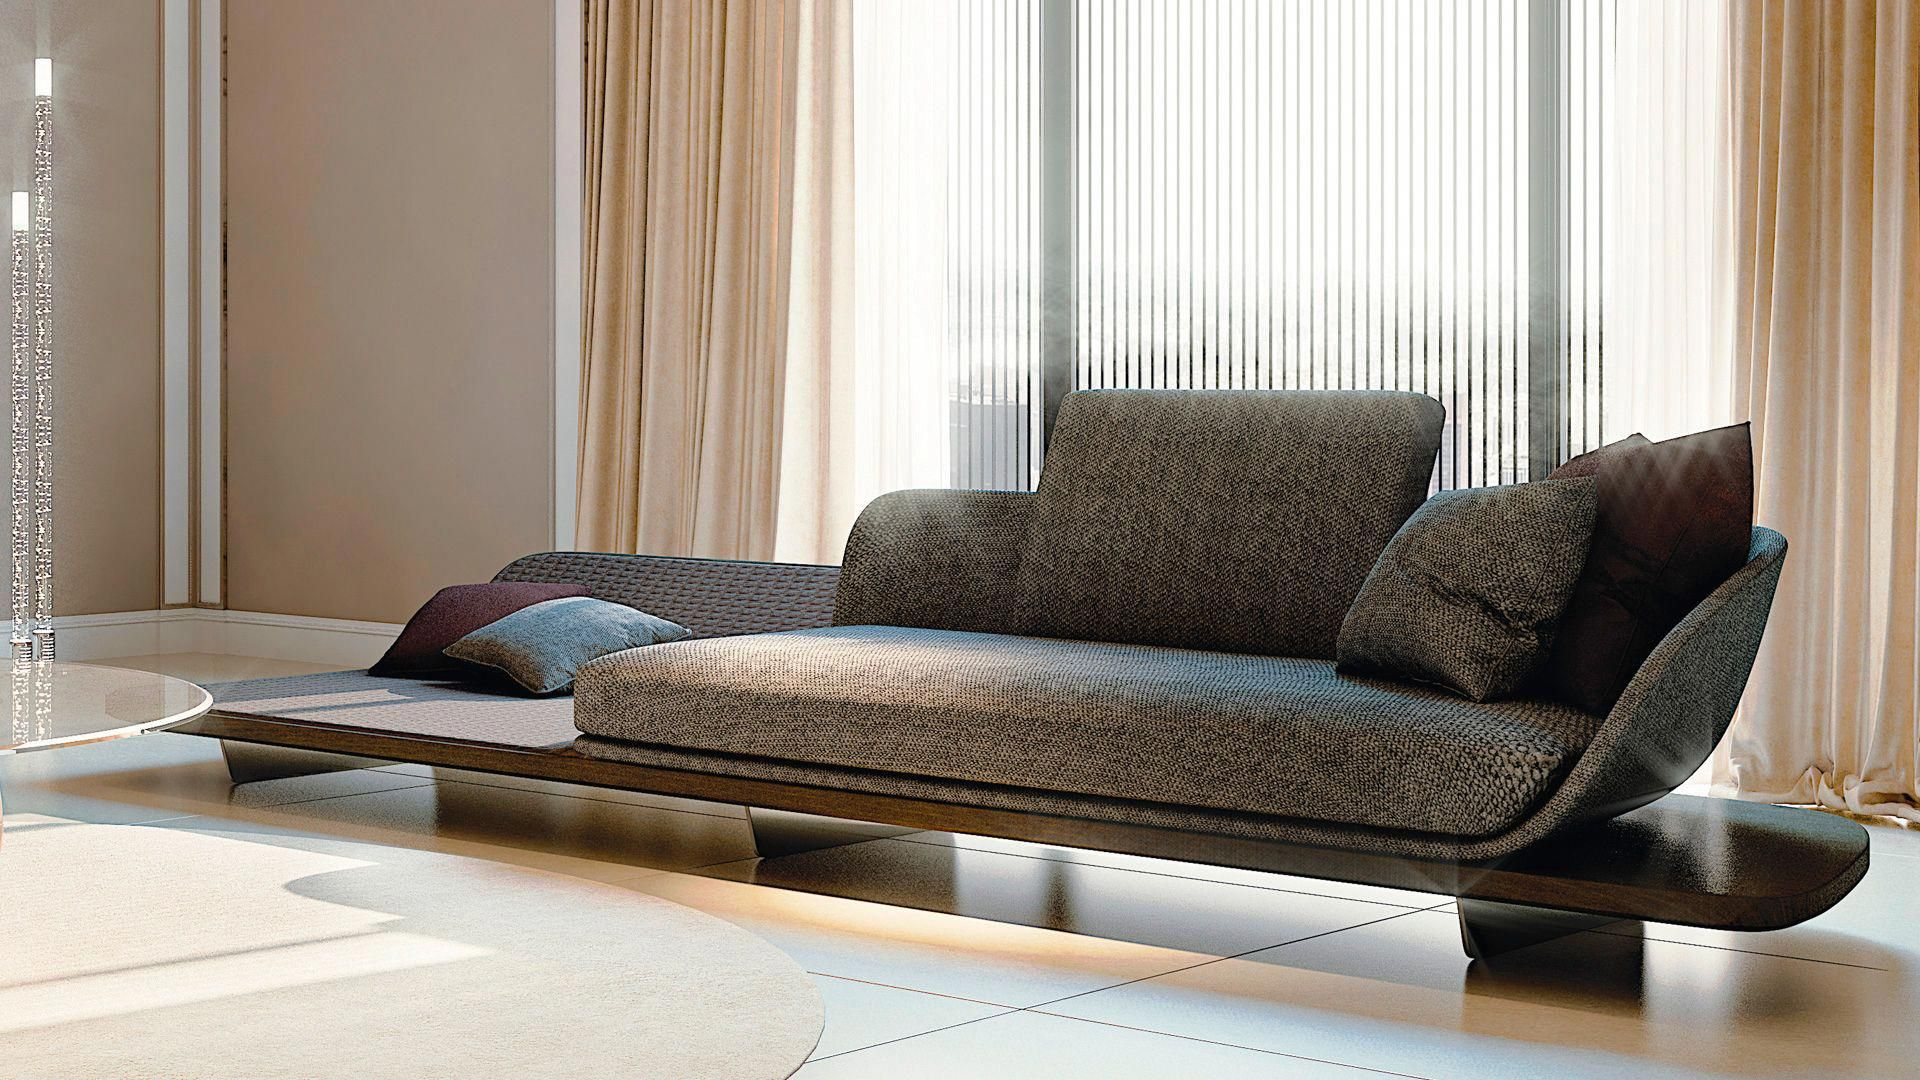 Best High End Italian Segno Chaise Lounge Italian Designer 400 x 300